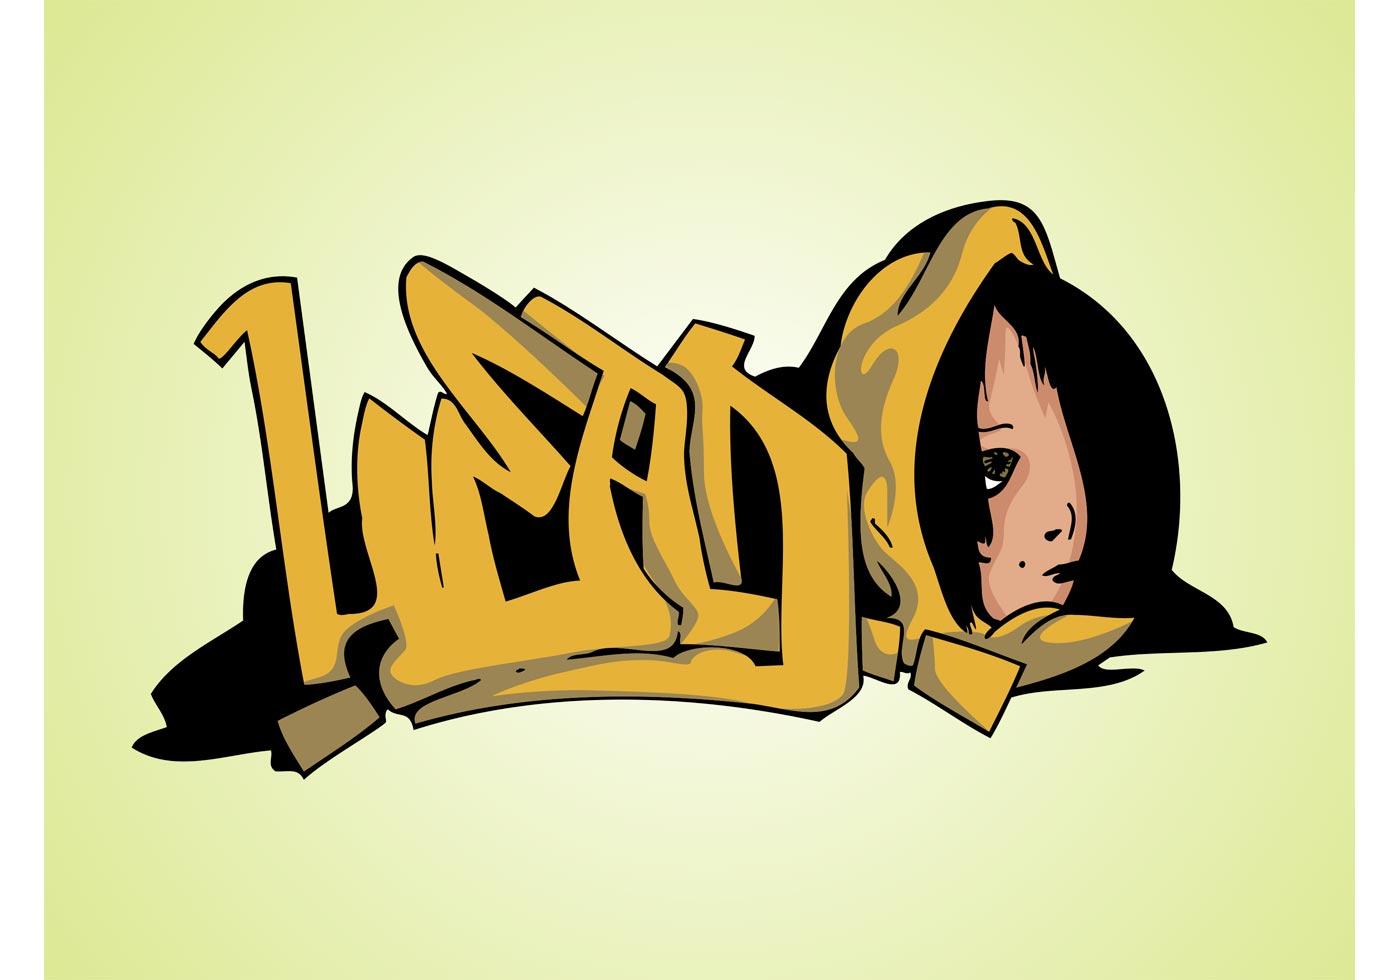 Head Graffiti Piece - Download Free Vector Art, Stock ...